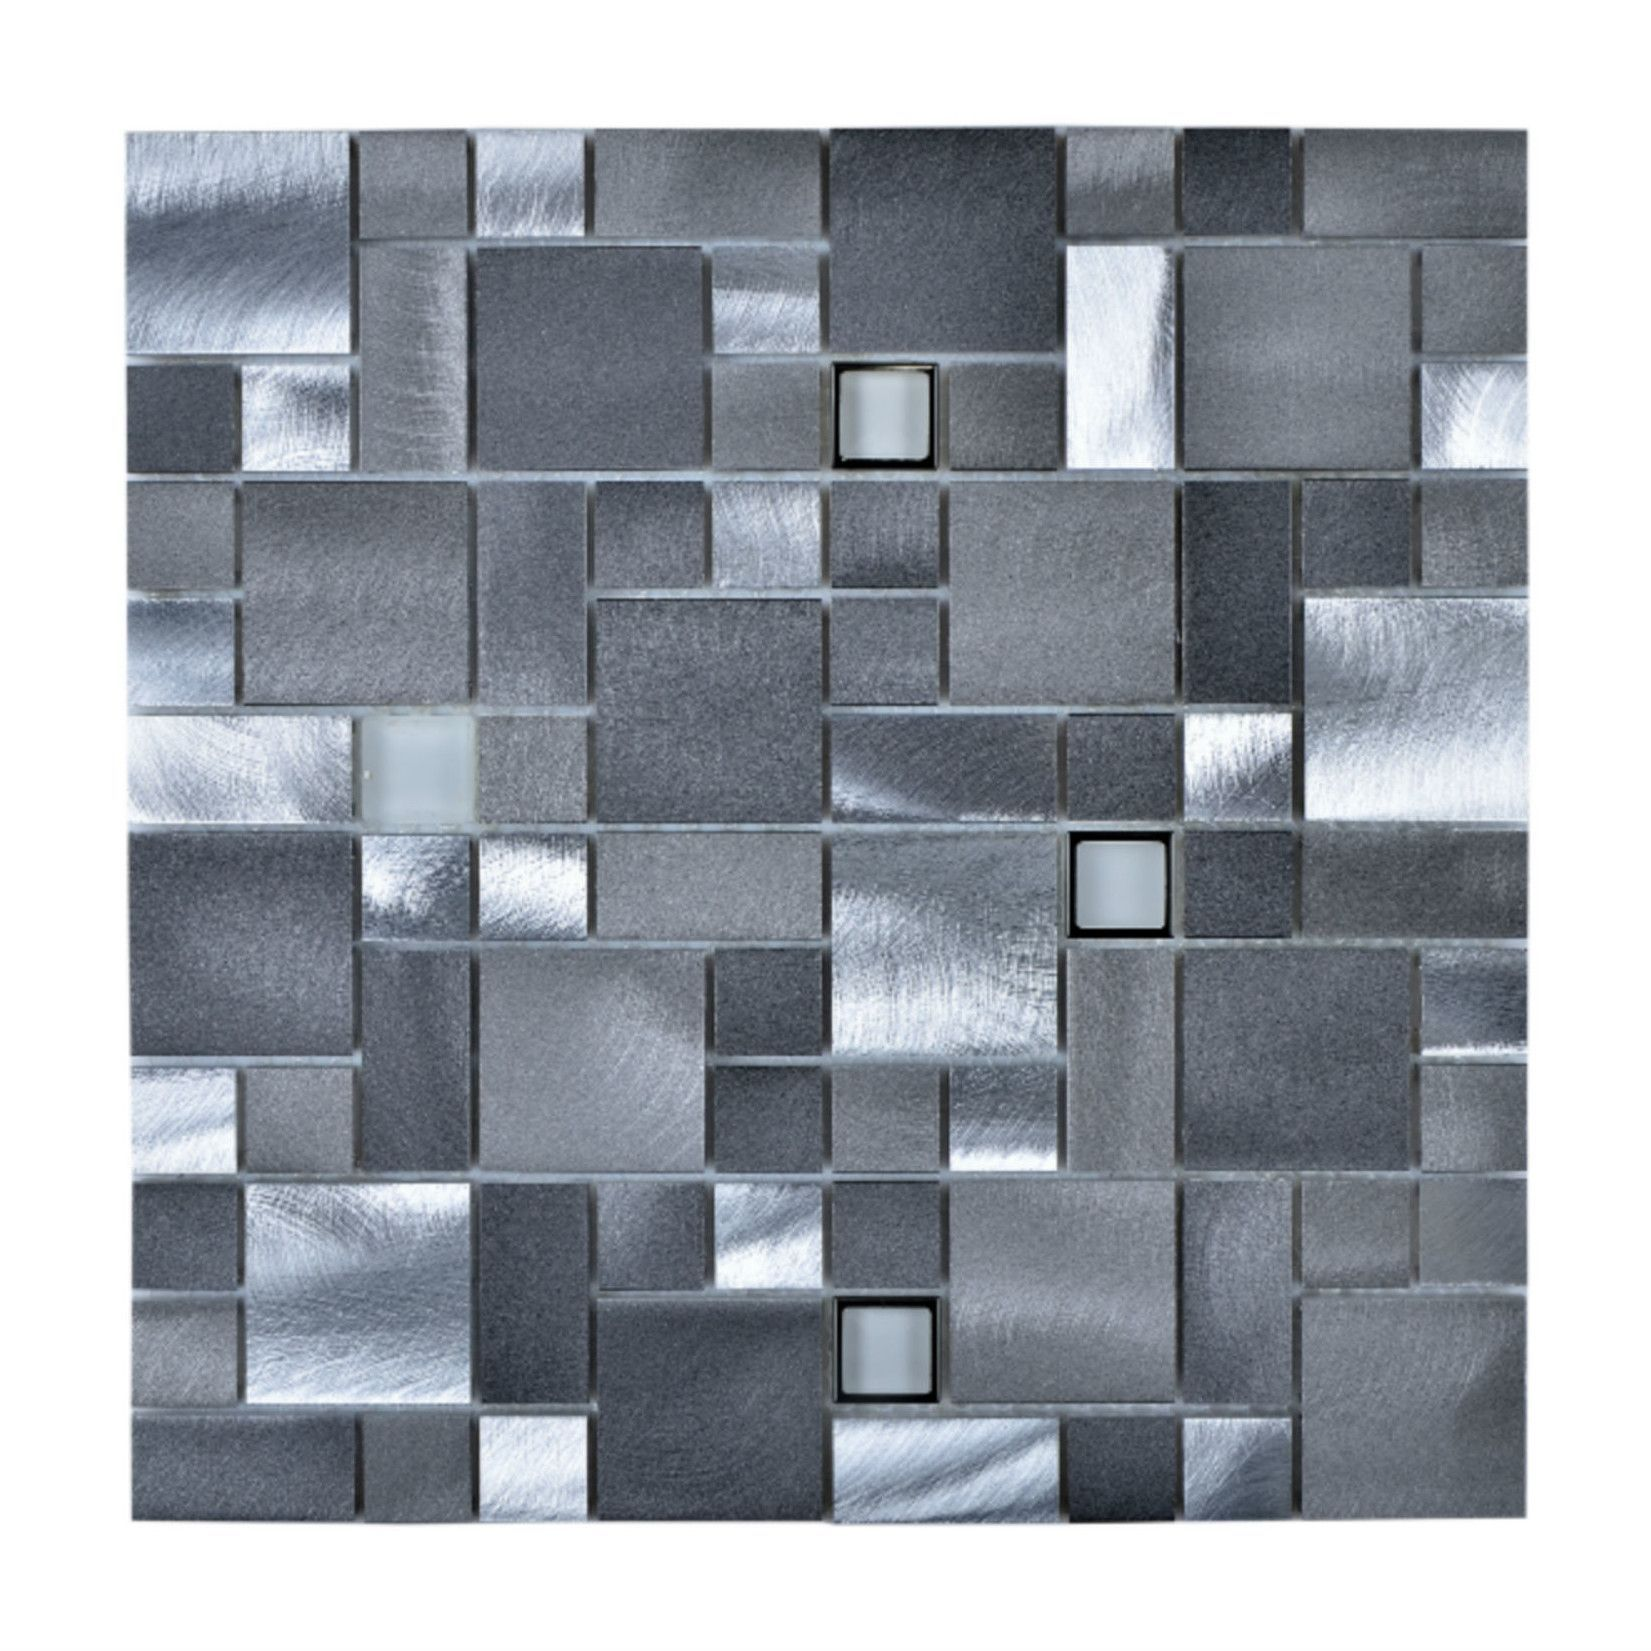 Random Sized Aluminum Mosaic Tile In Brushed Aluminum Gray Legion Furniture Modern Glass Tile Wall Tiles